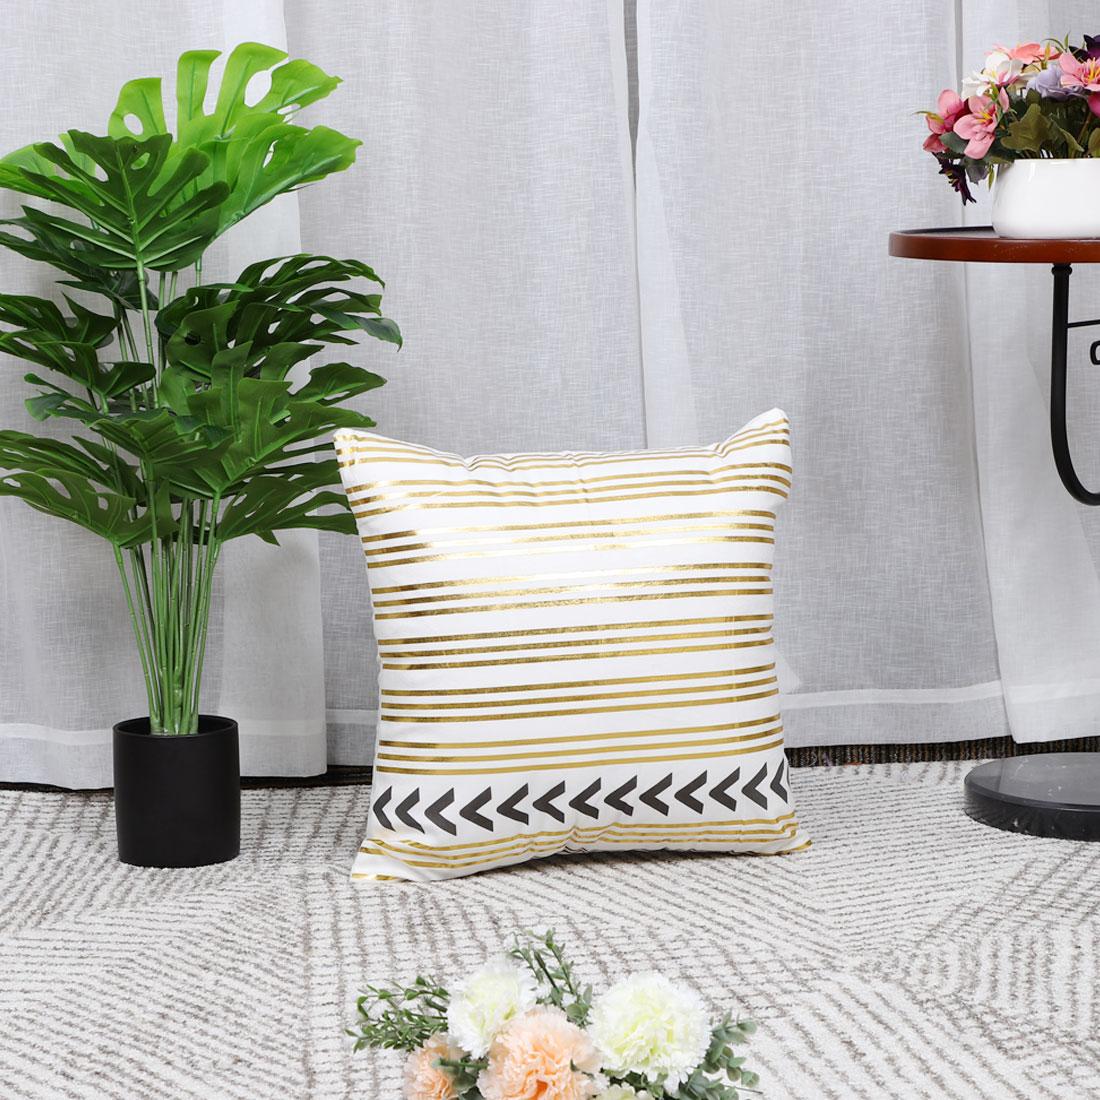 Decoration-Pillow-Covers-Cotton-Linen-Throw-Pillow-Case-Cushion-Cover thumbnail 45